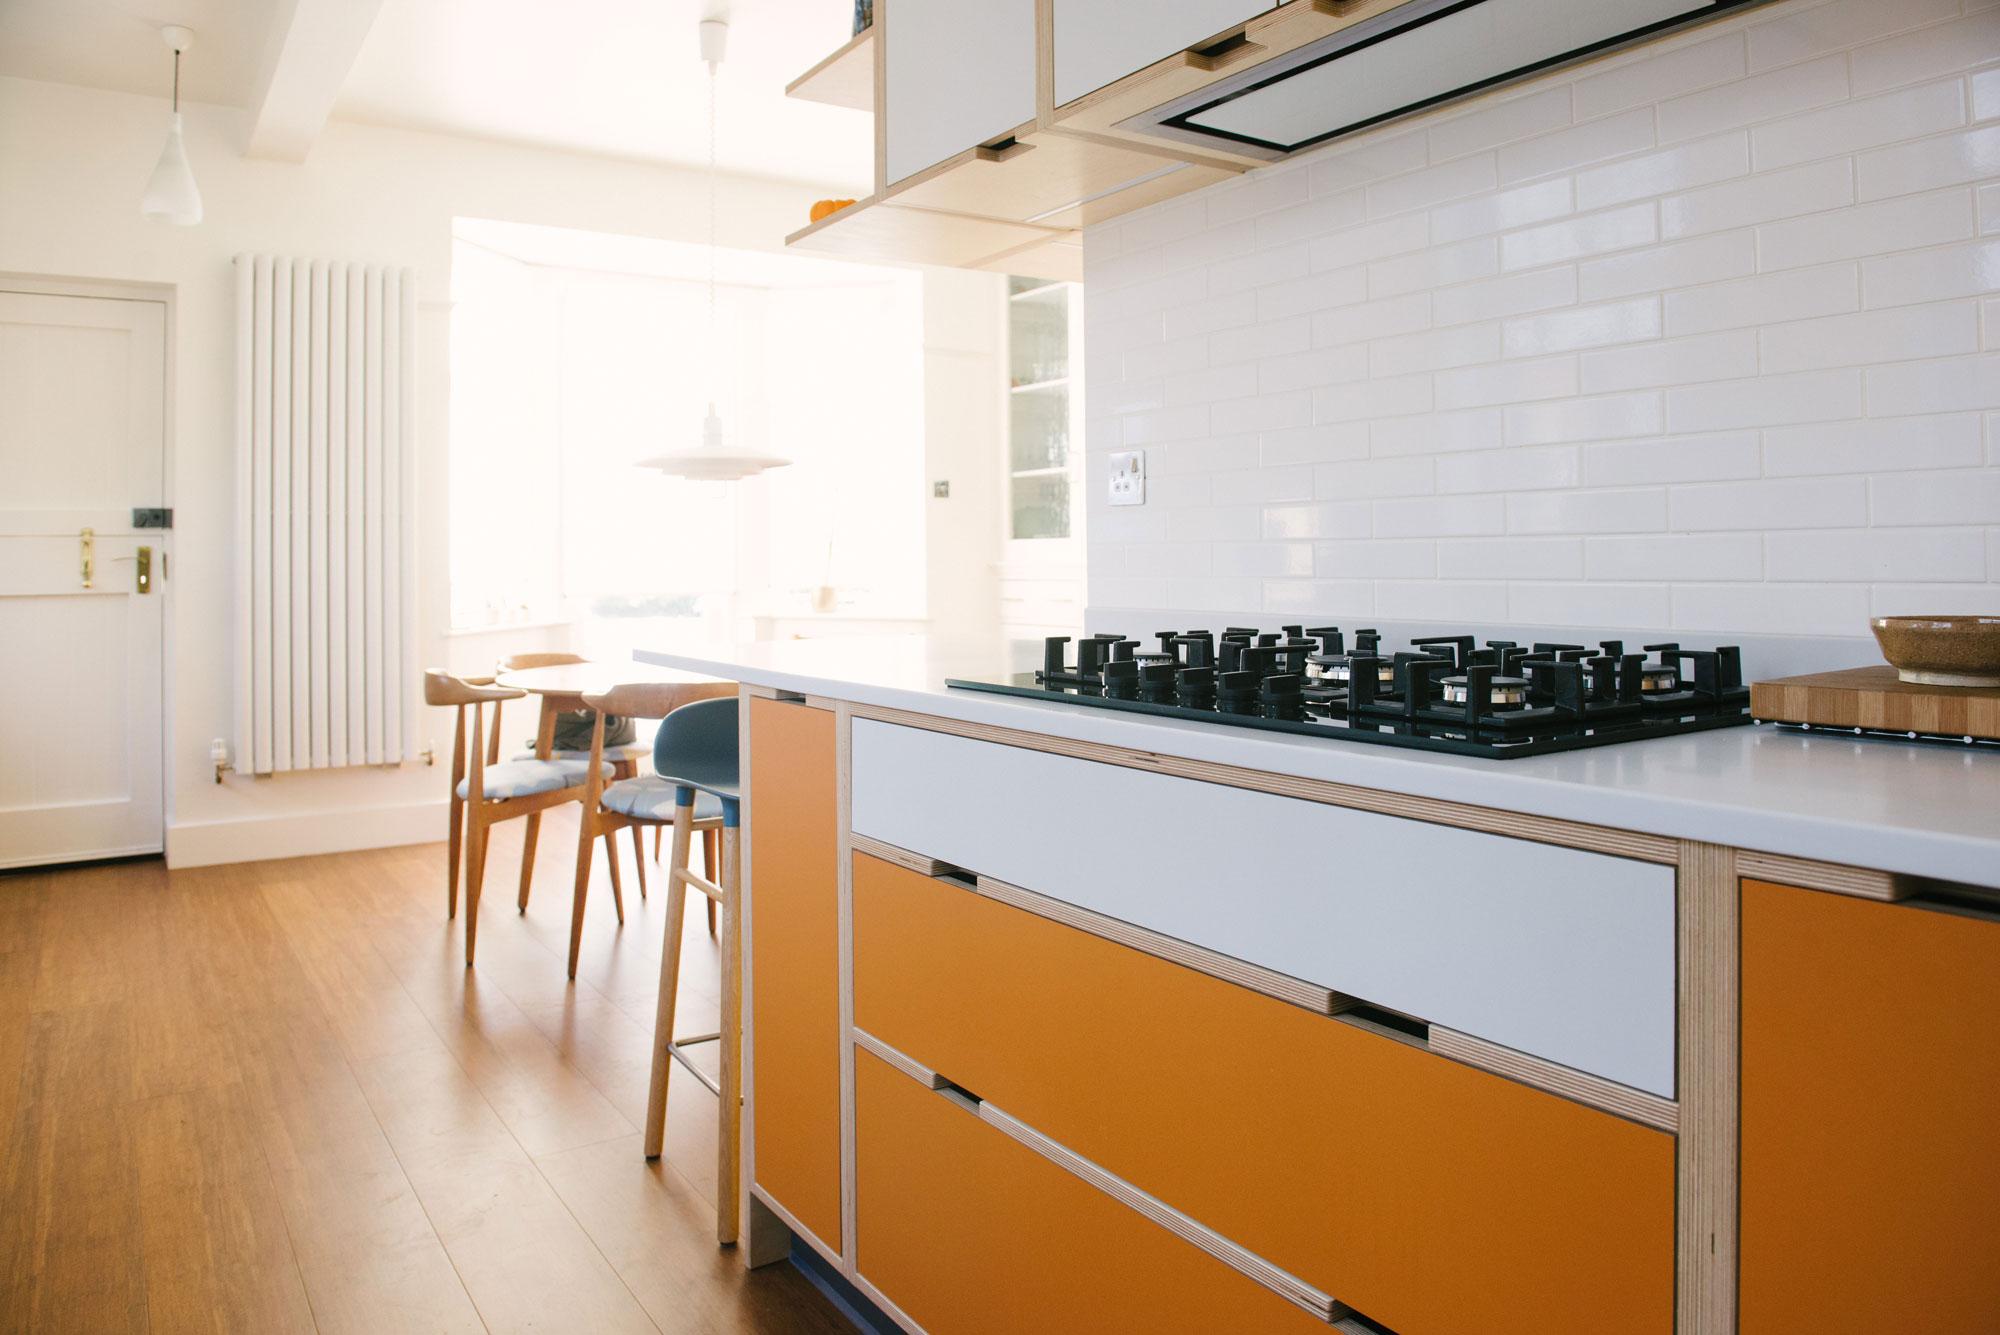 Hob in Orange and White Laminated Plywood Kitchen